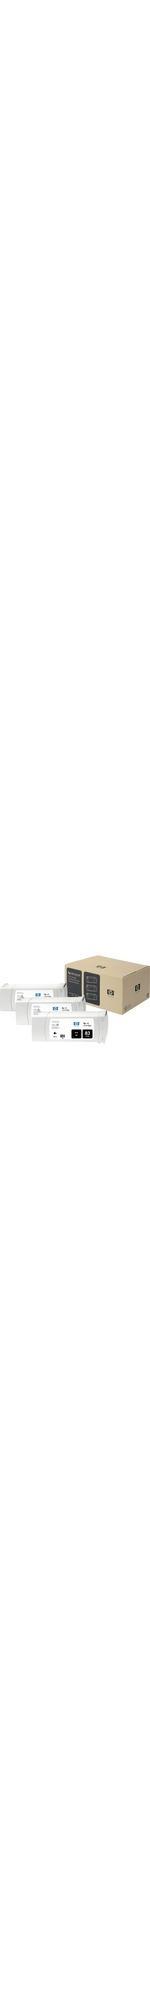 HP No. 83 Ink Cartridge - Black